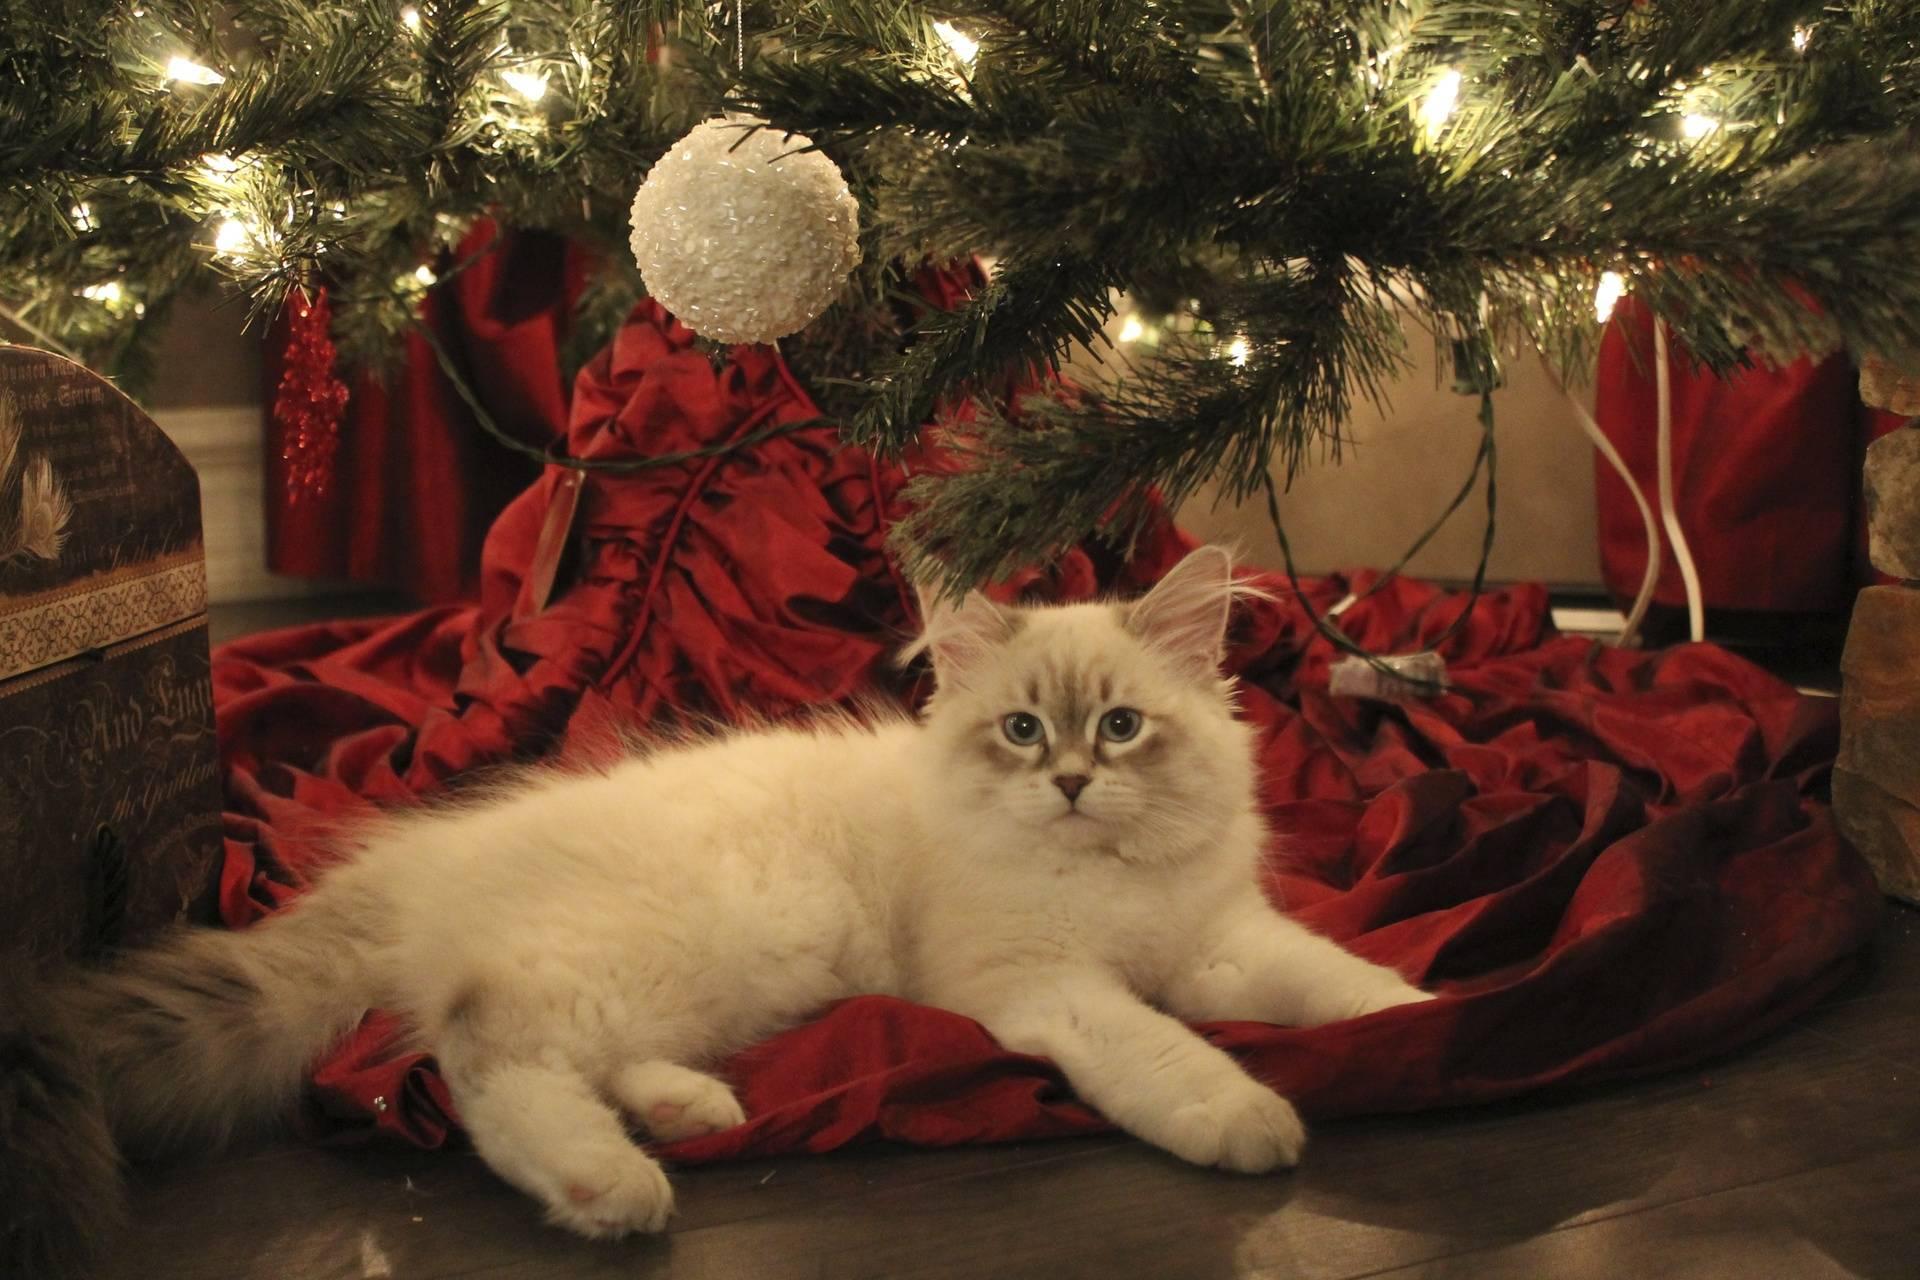 Mia under the Christmas tree!